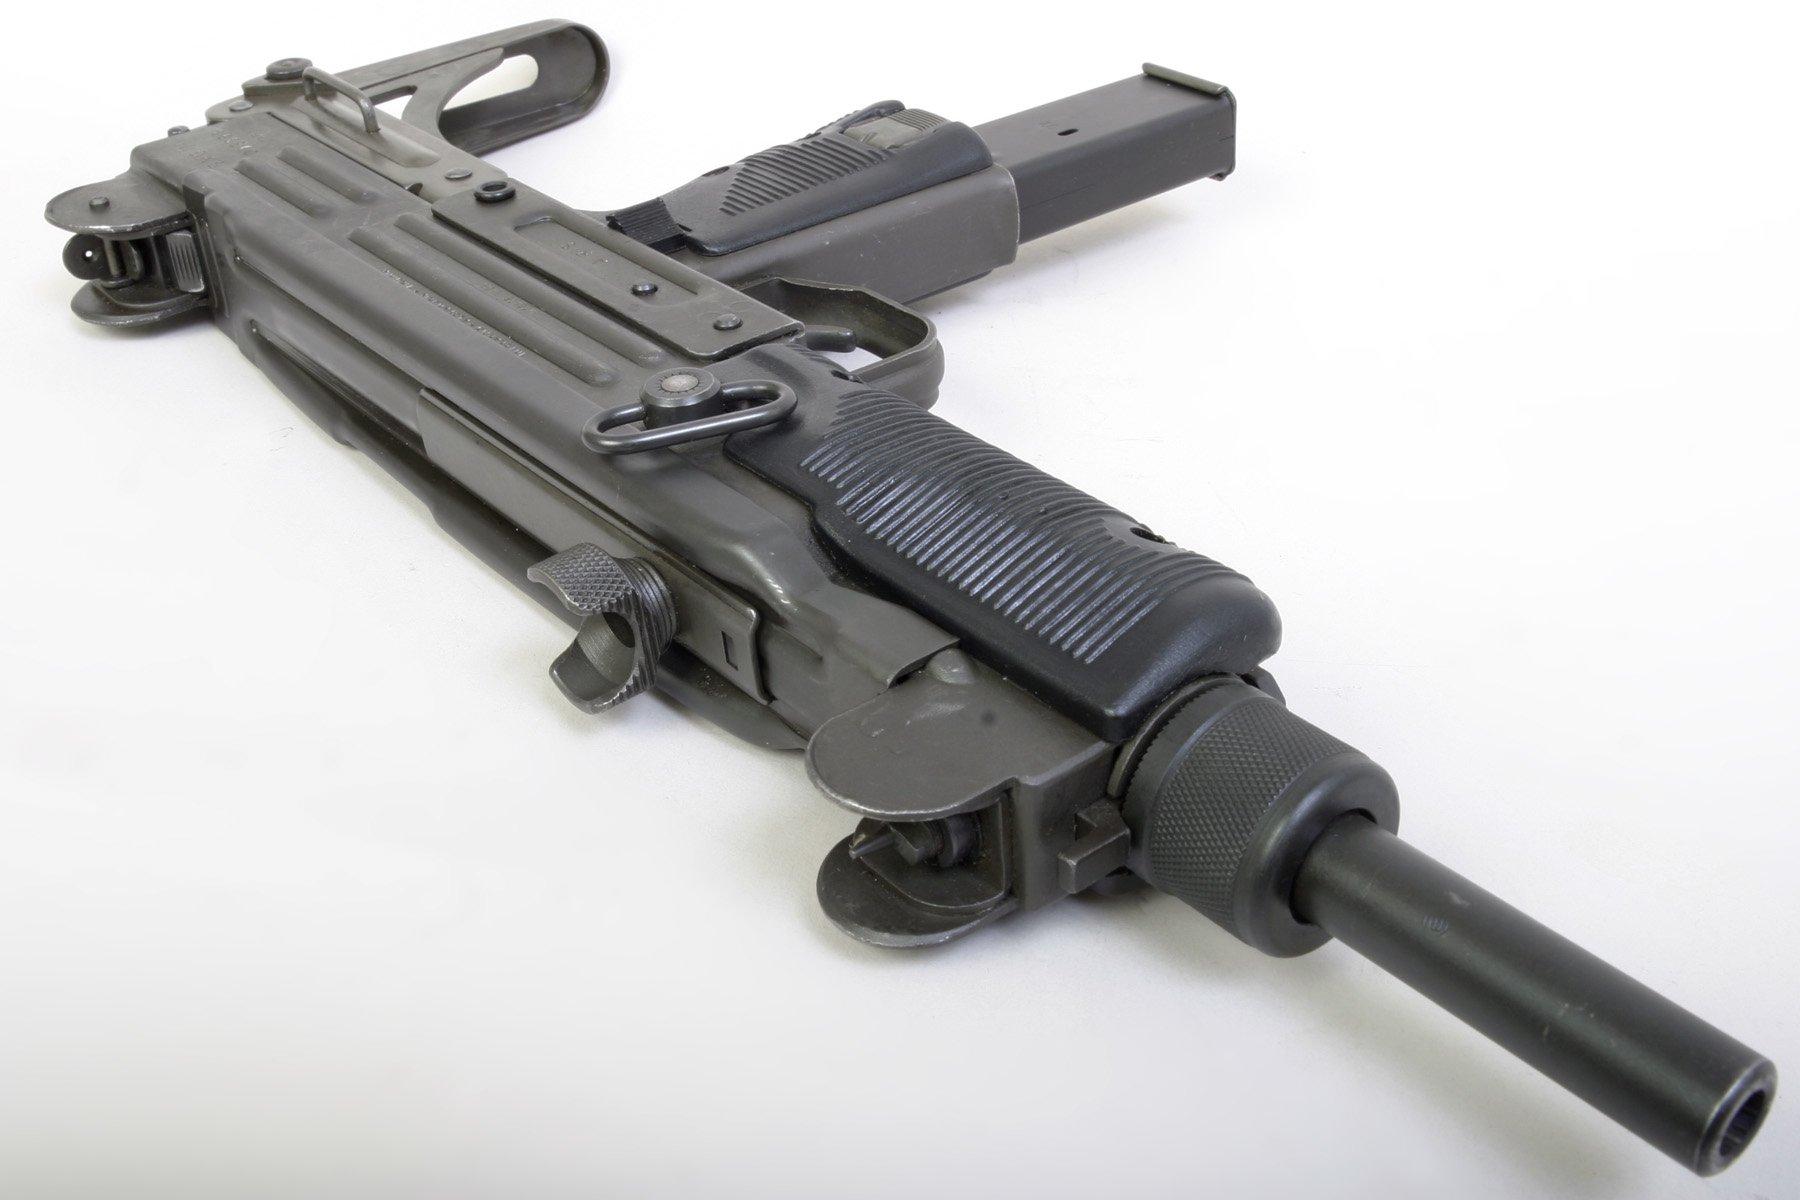 Machine Gun Wallpaper 1800x1200